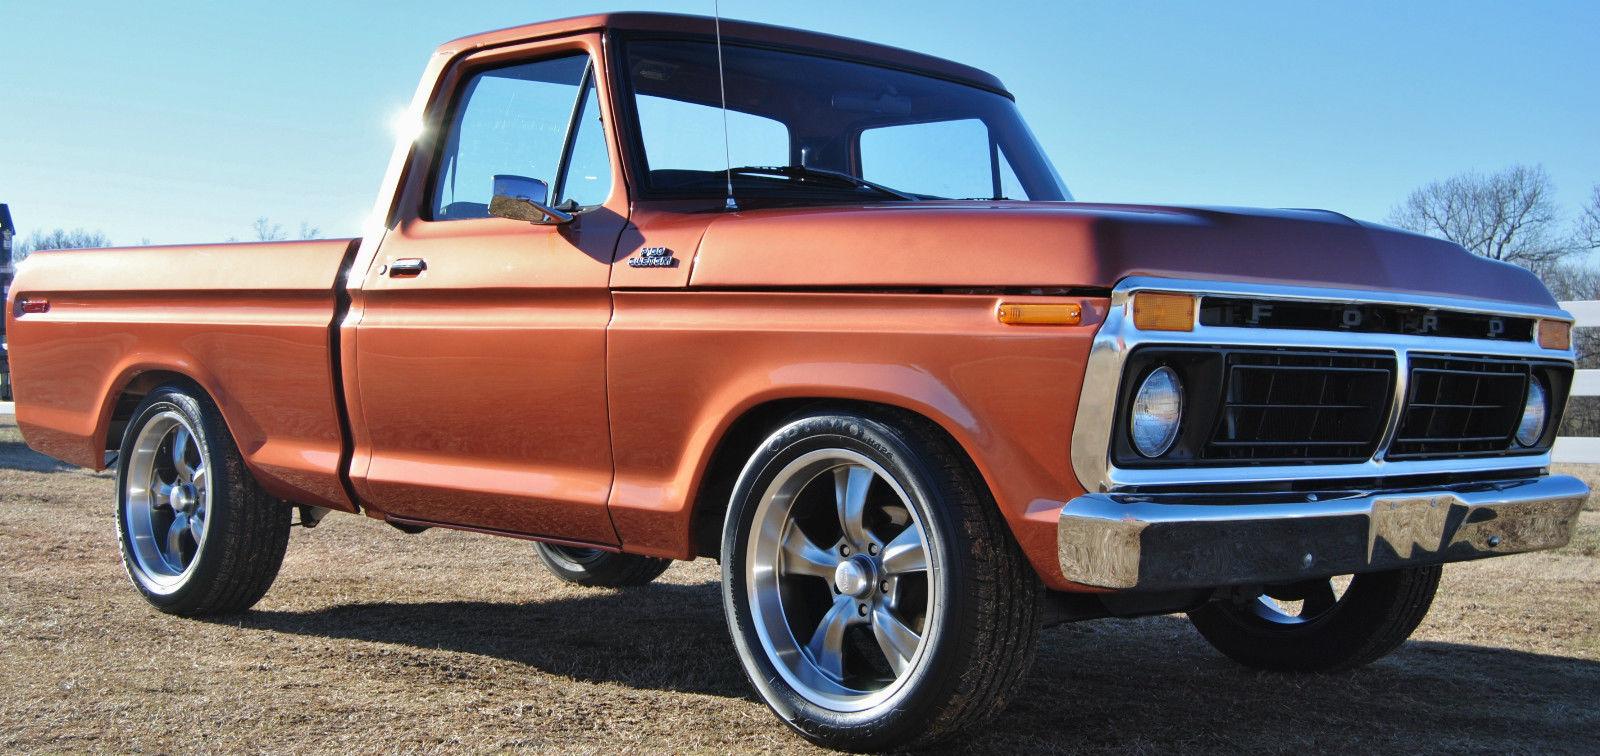 1977 f100 custom new paint lowered rocket racing wheels 351 modified 20s classic ford f 100